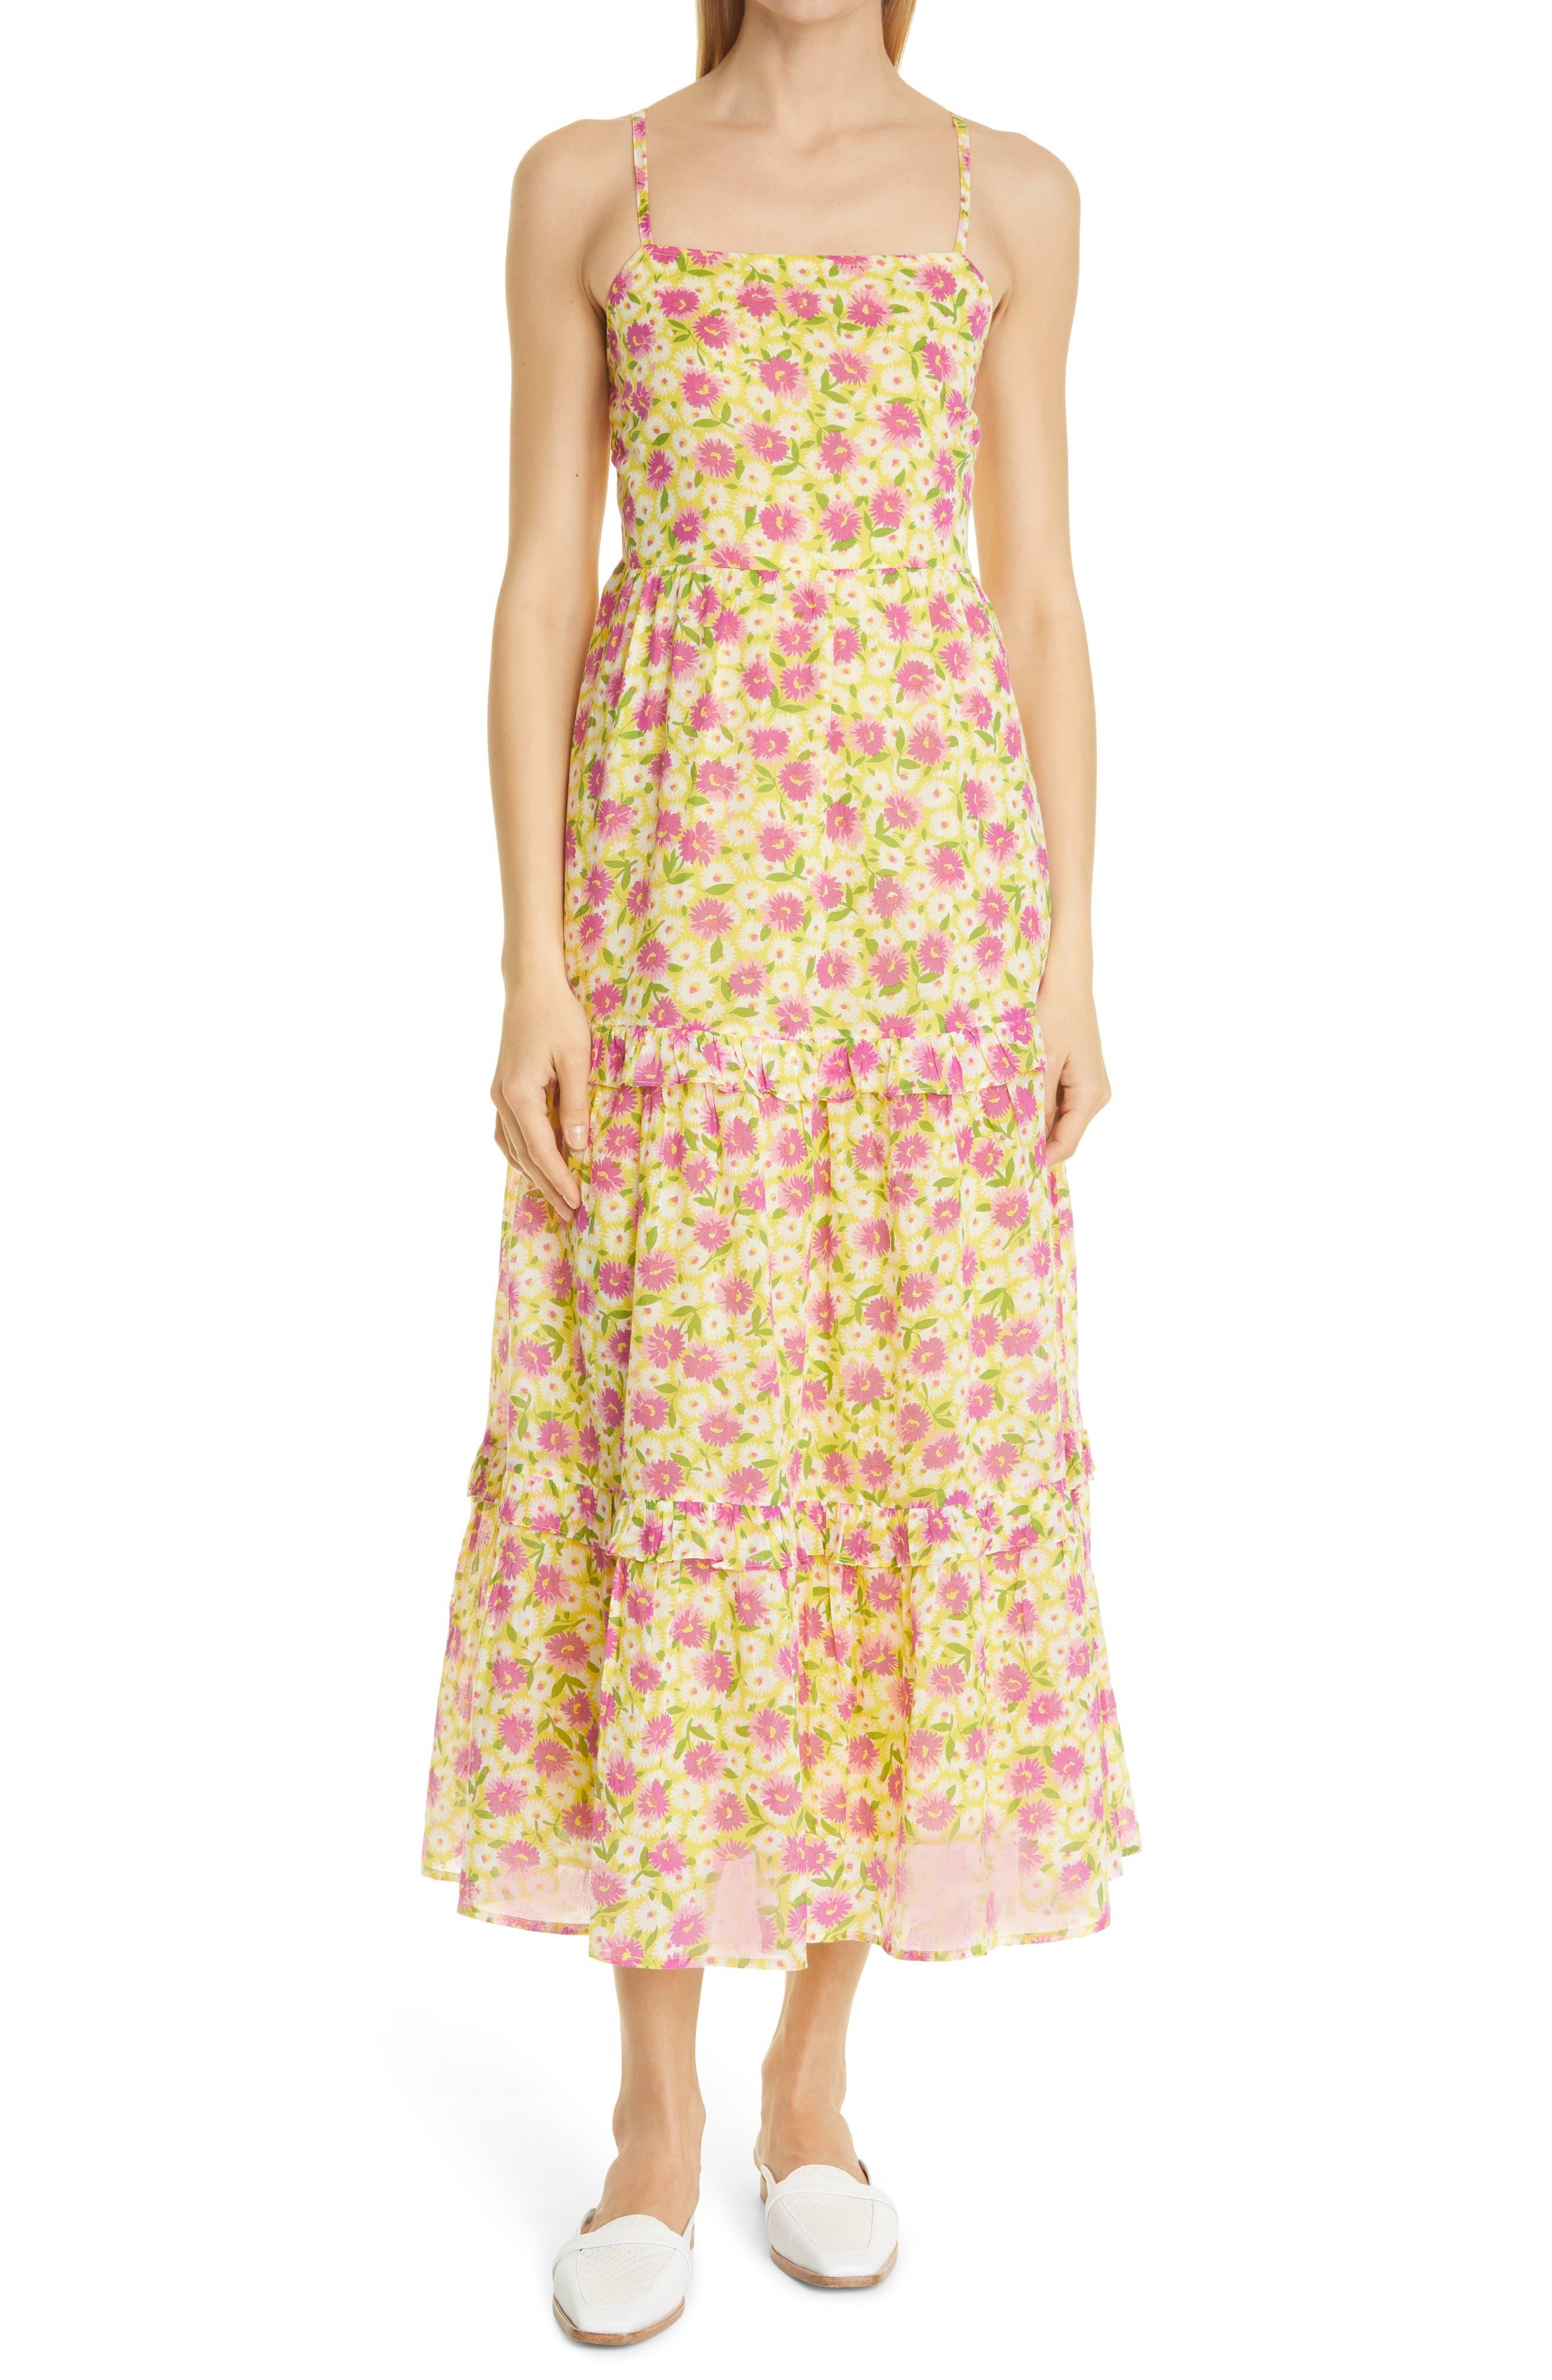 Hazel Floral Ruffle Cotton Midi Sundress